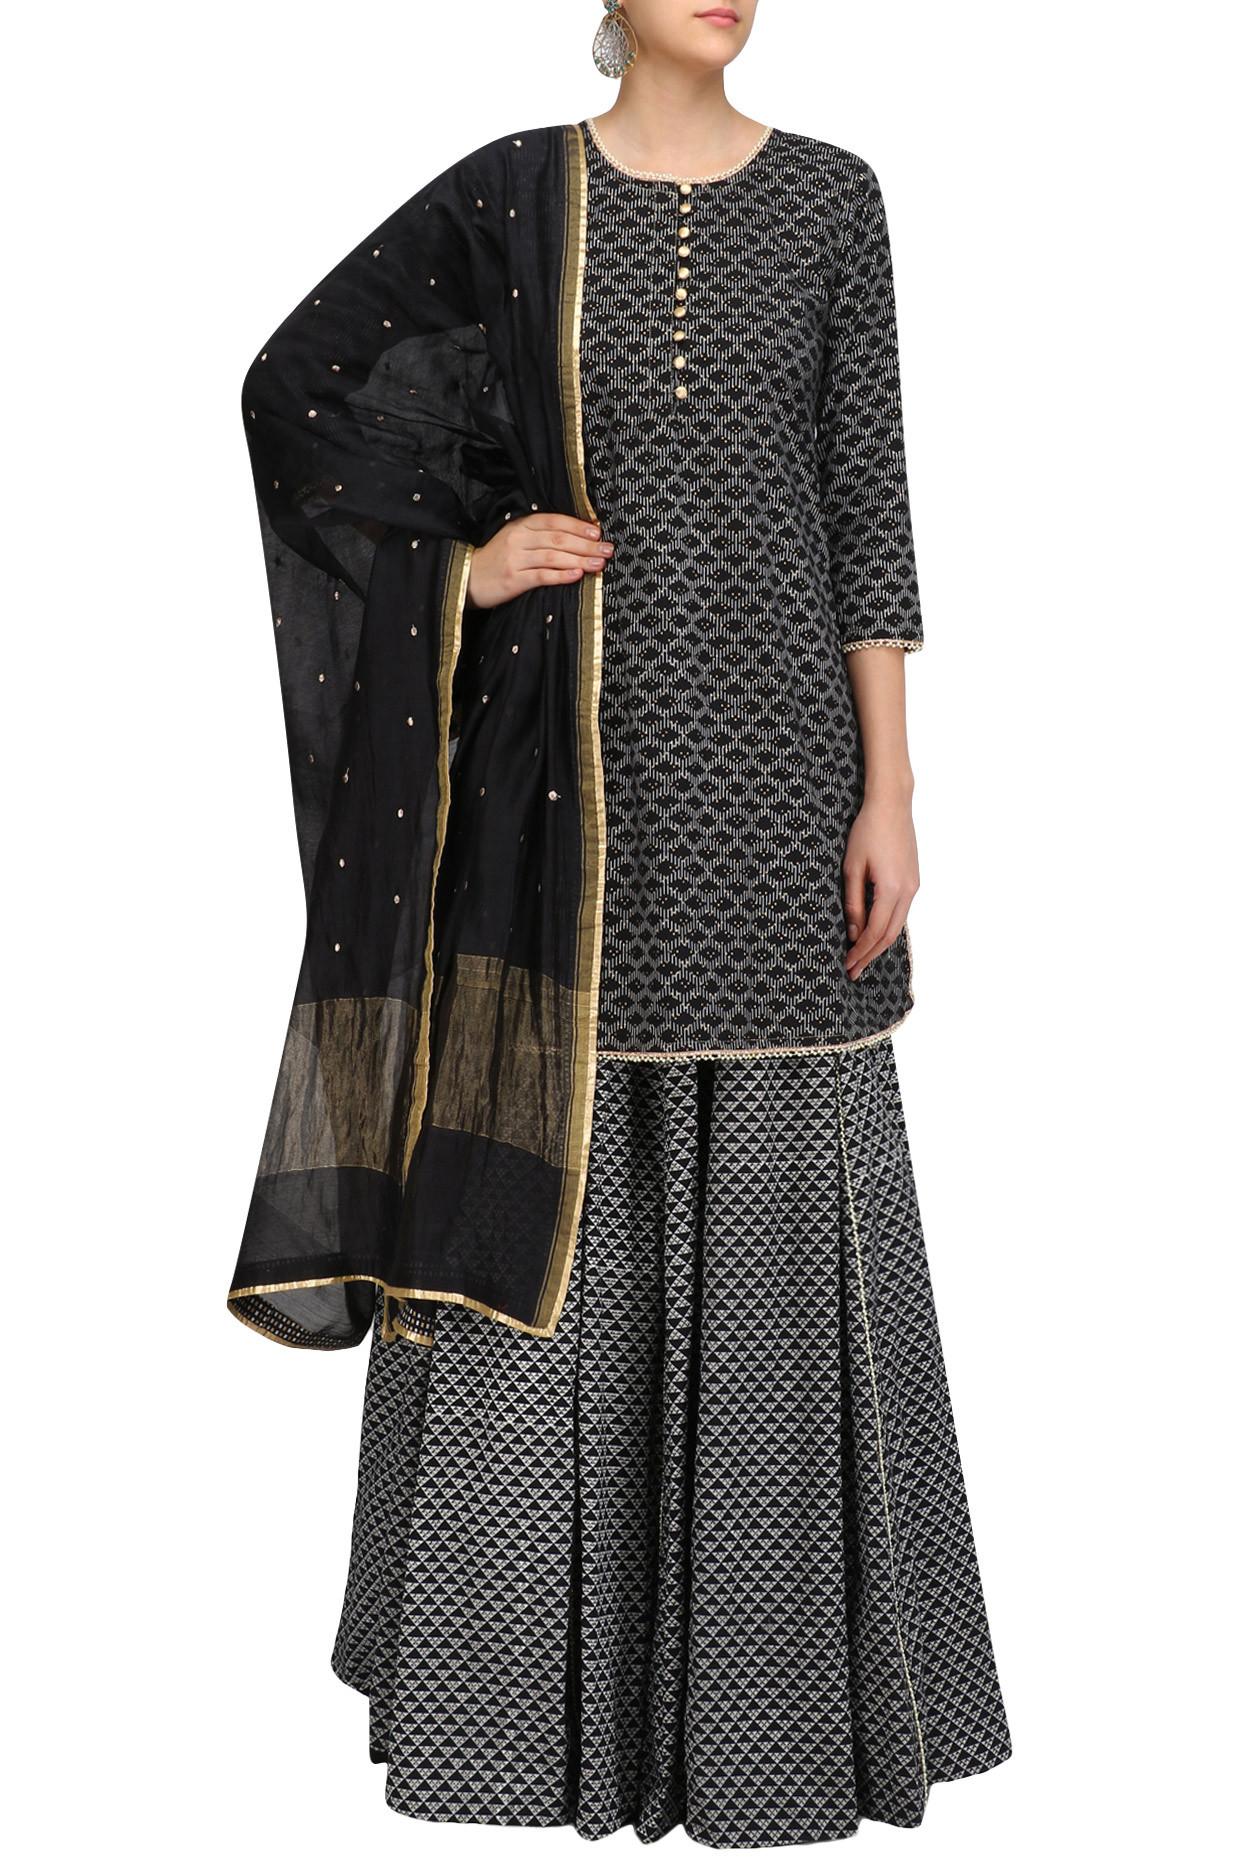 Black Pearl Embroidered Short Kurta and Skirt Set by Surendri